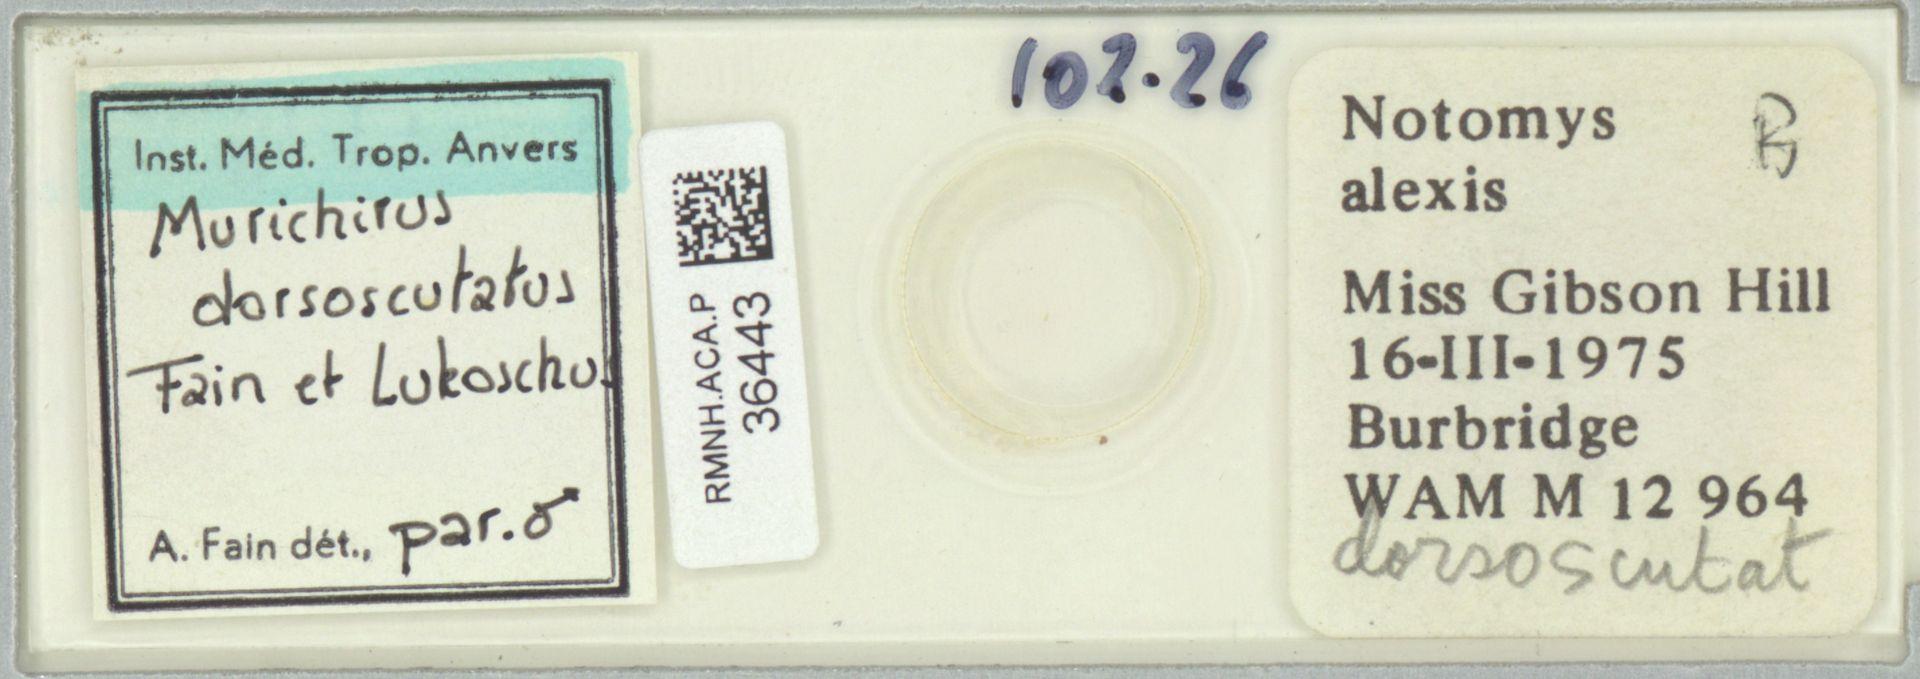 RMNH.ACA.P.36443 | Murichirus dorsoscutatus Fain & Lukoschus